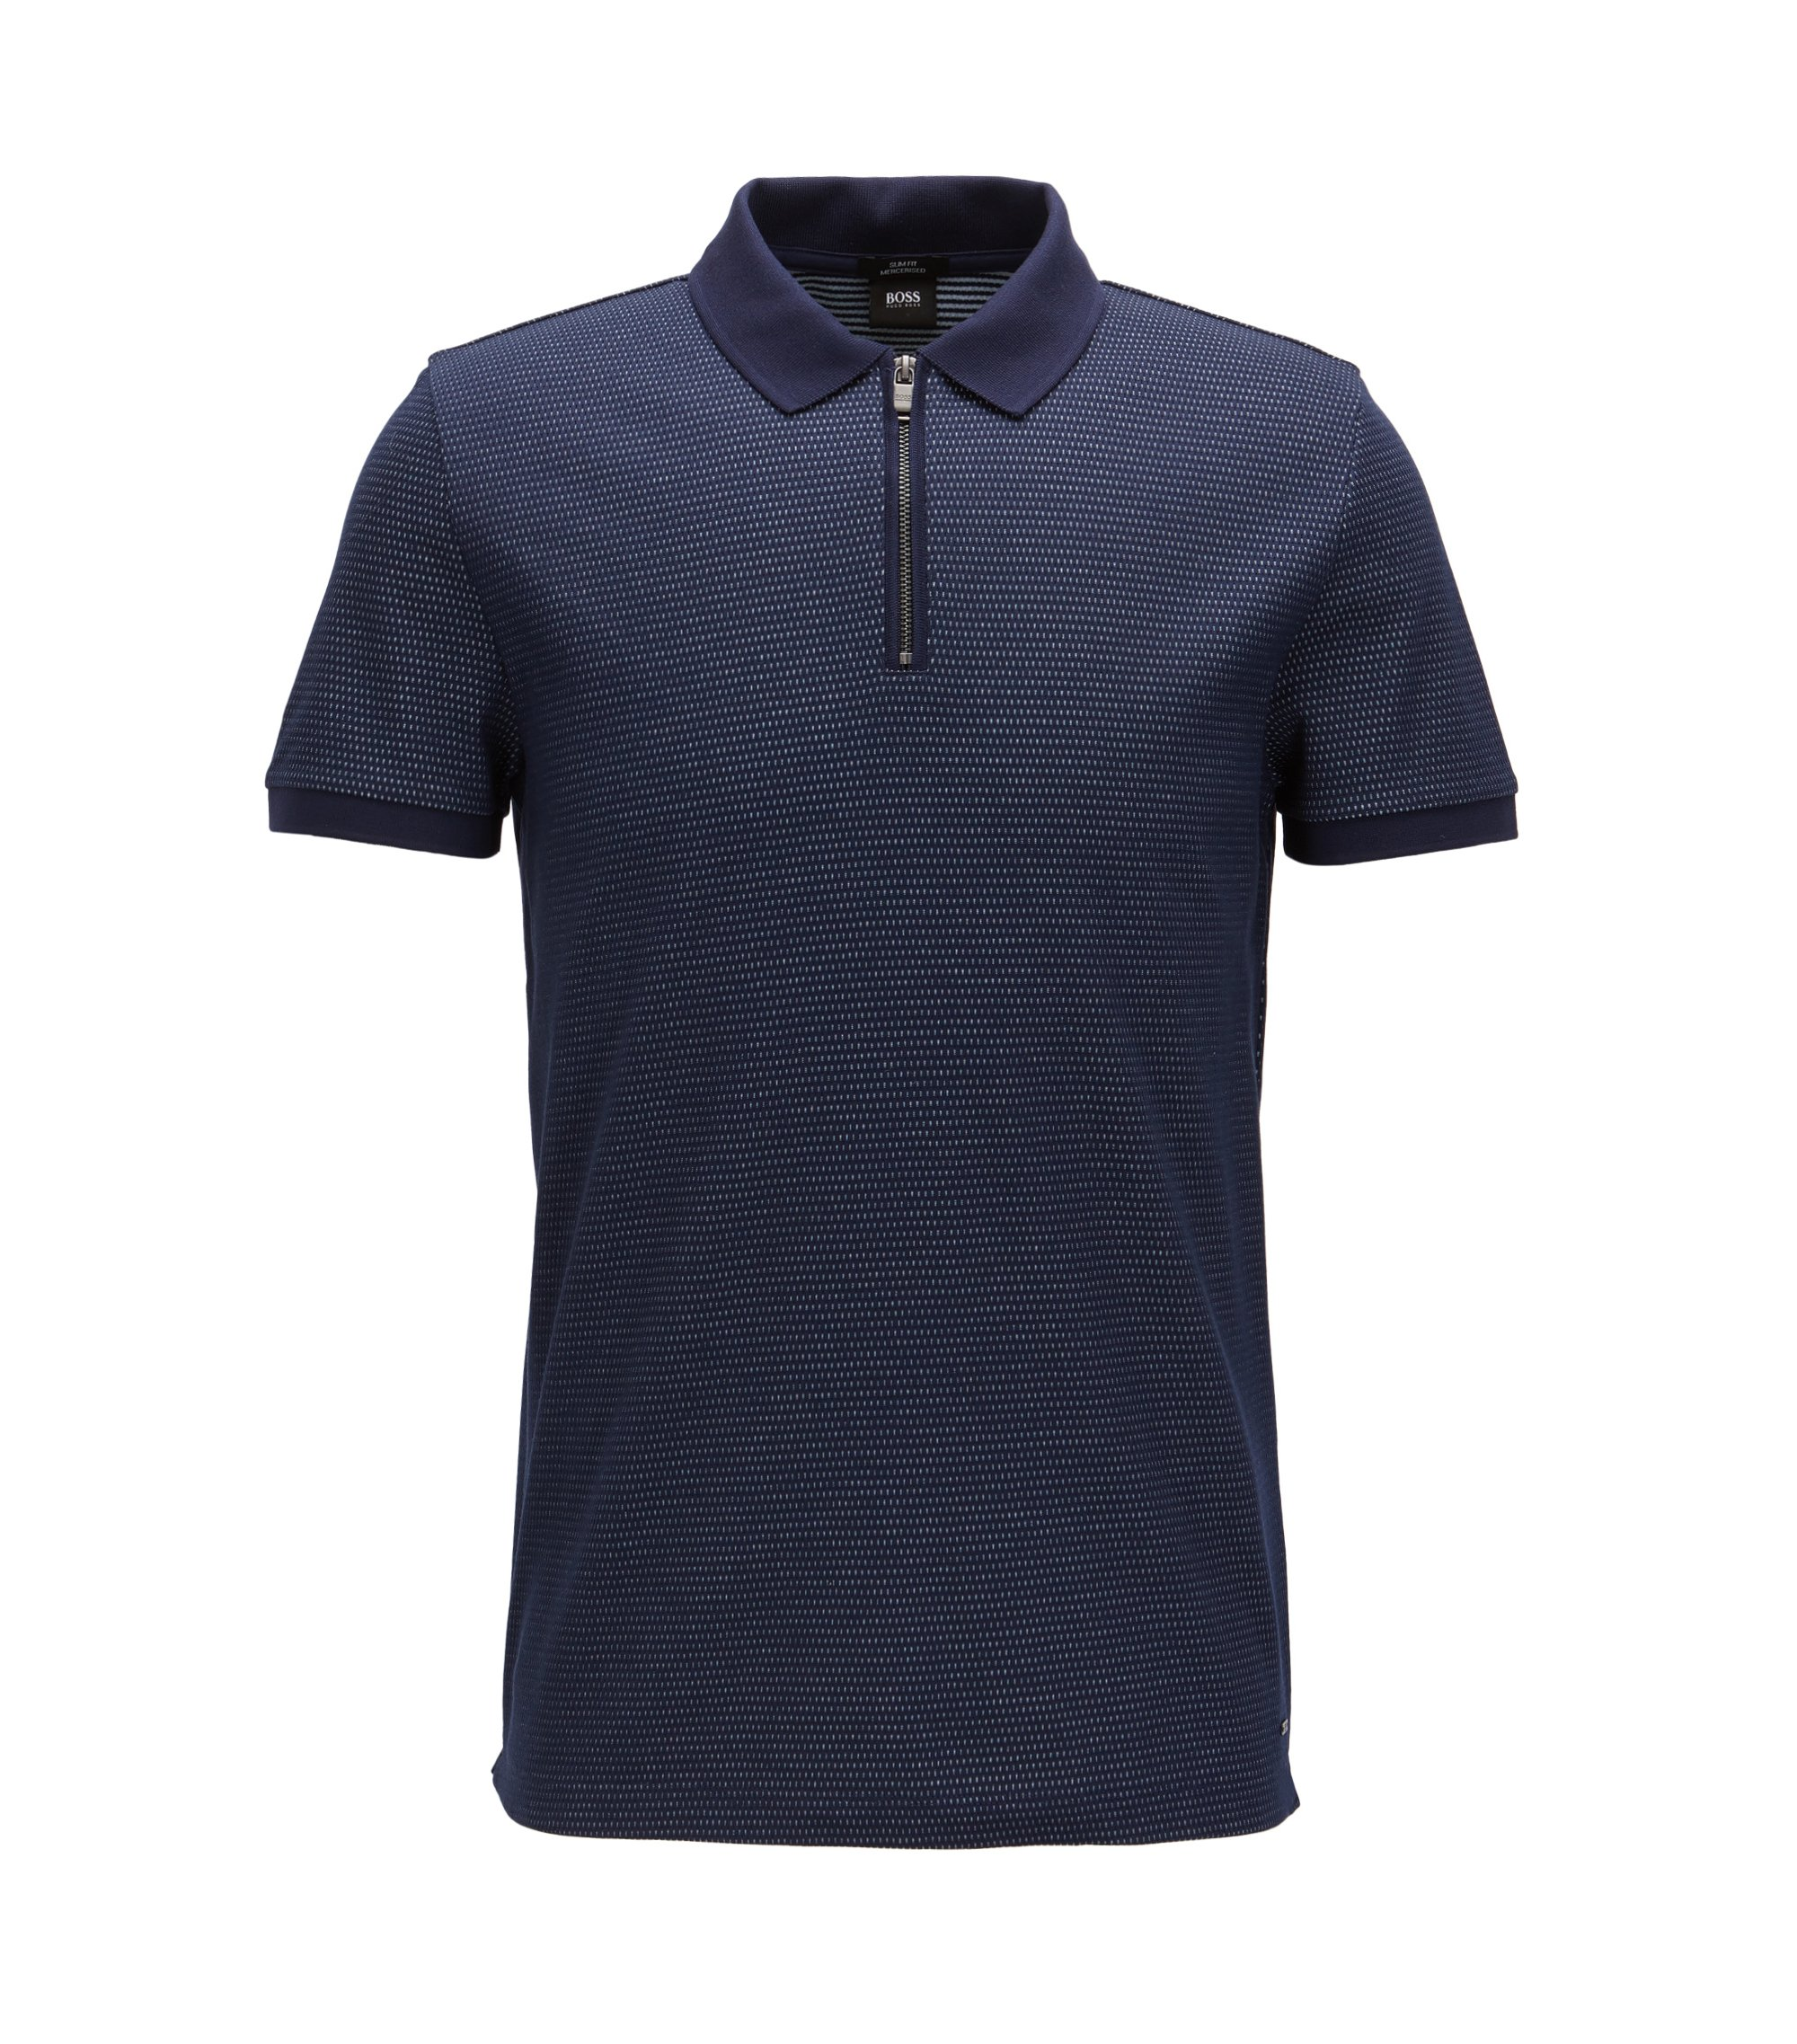 Jacquard Mercerized Cotton Polo Shirt, Slim Fit | Polston, Dark Blue